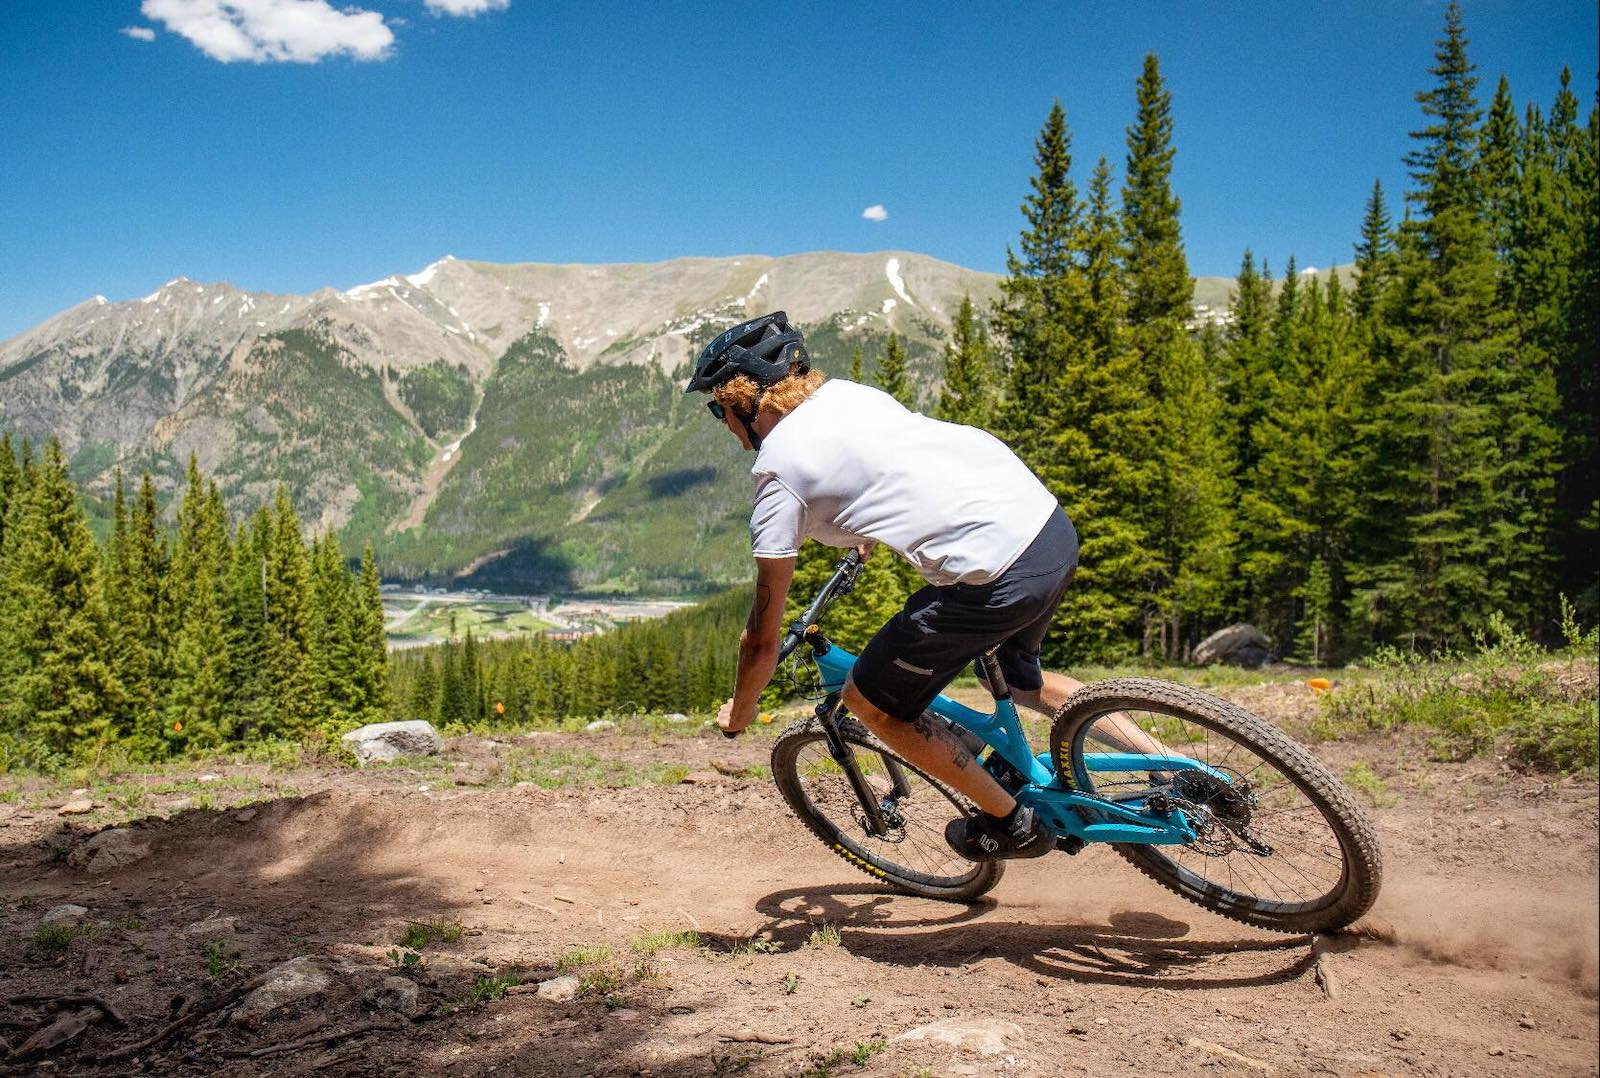 Image of a person biking at Copper Mountain in Colorado